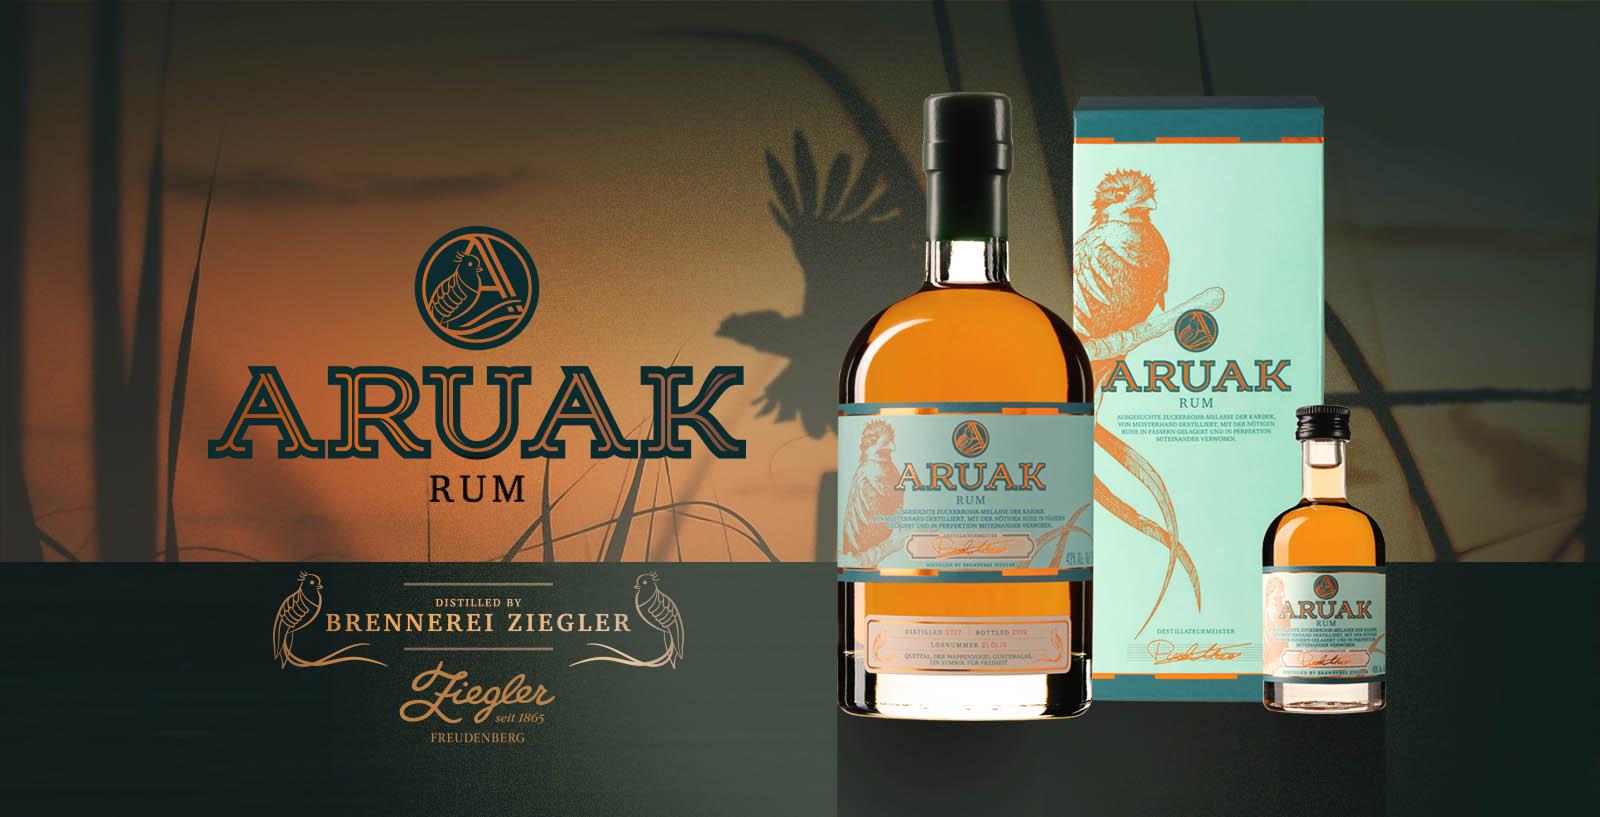 Aruak Rum - Ziegler Brennerei